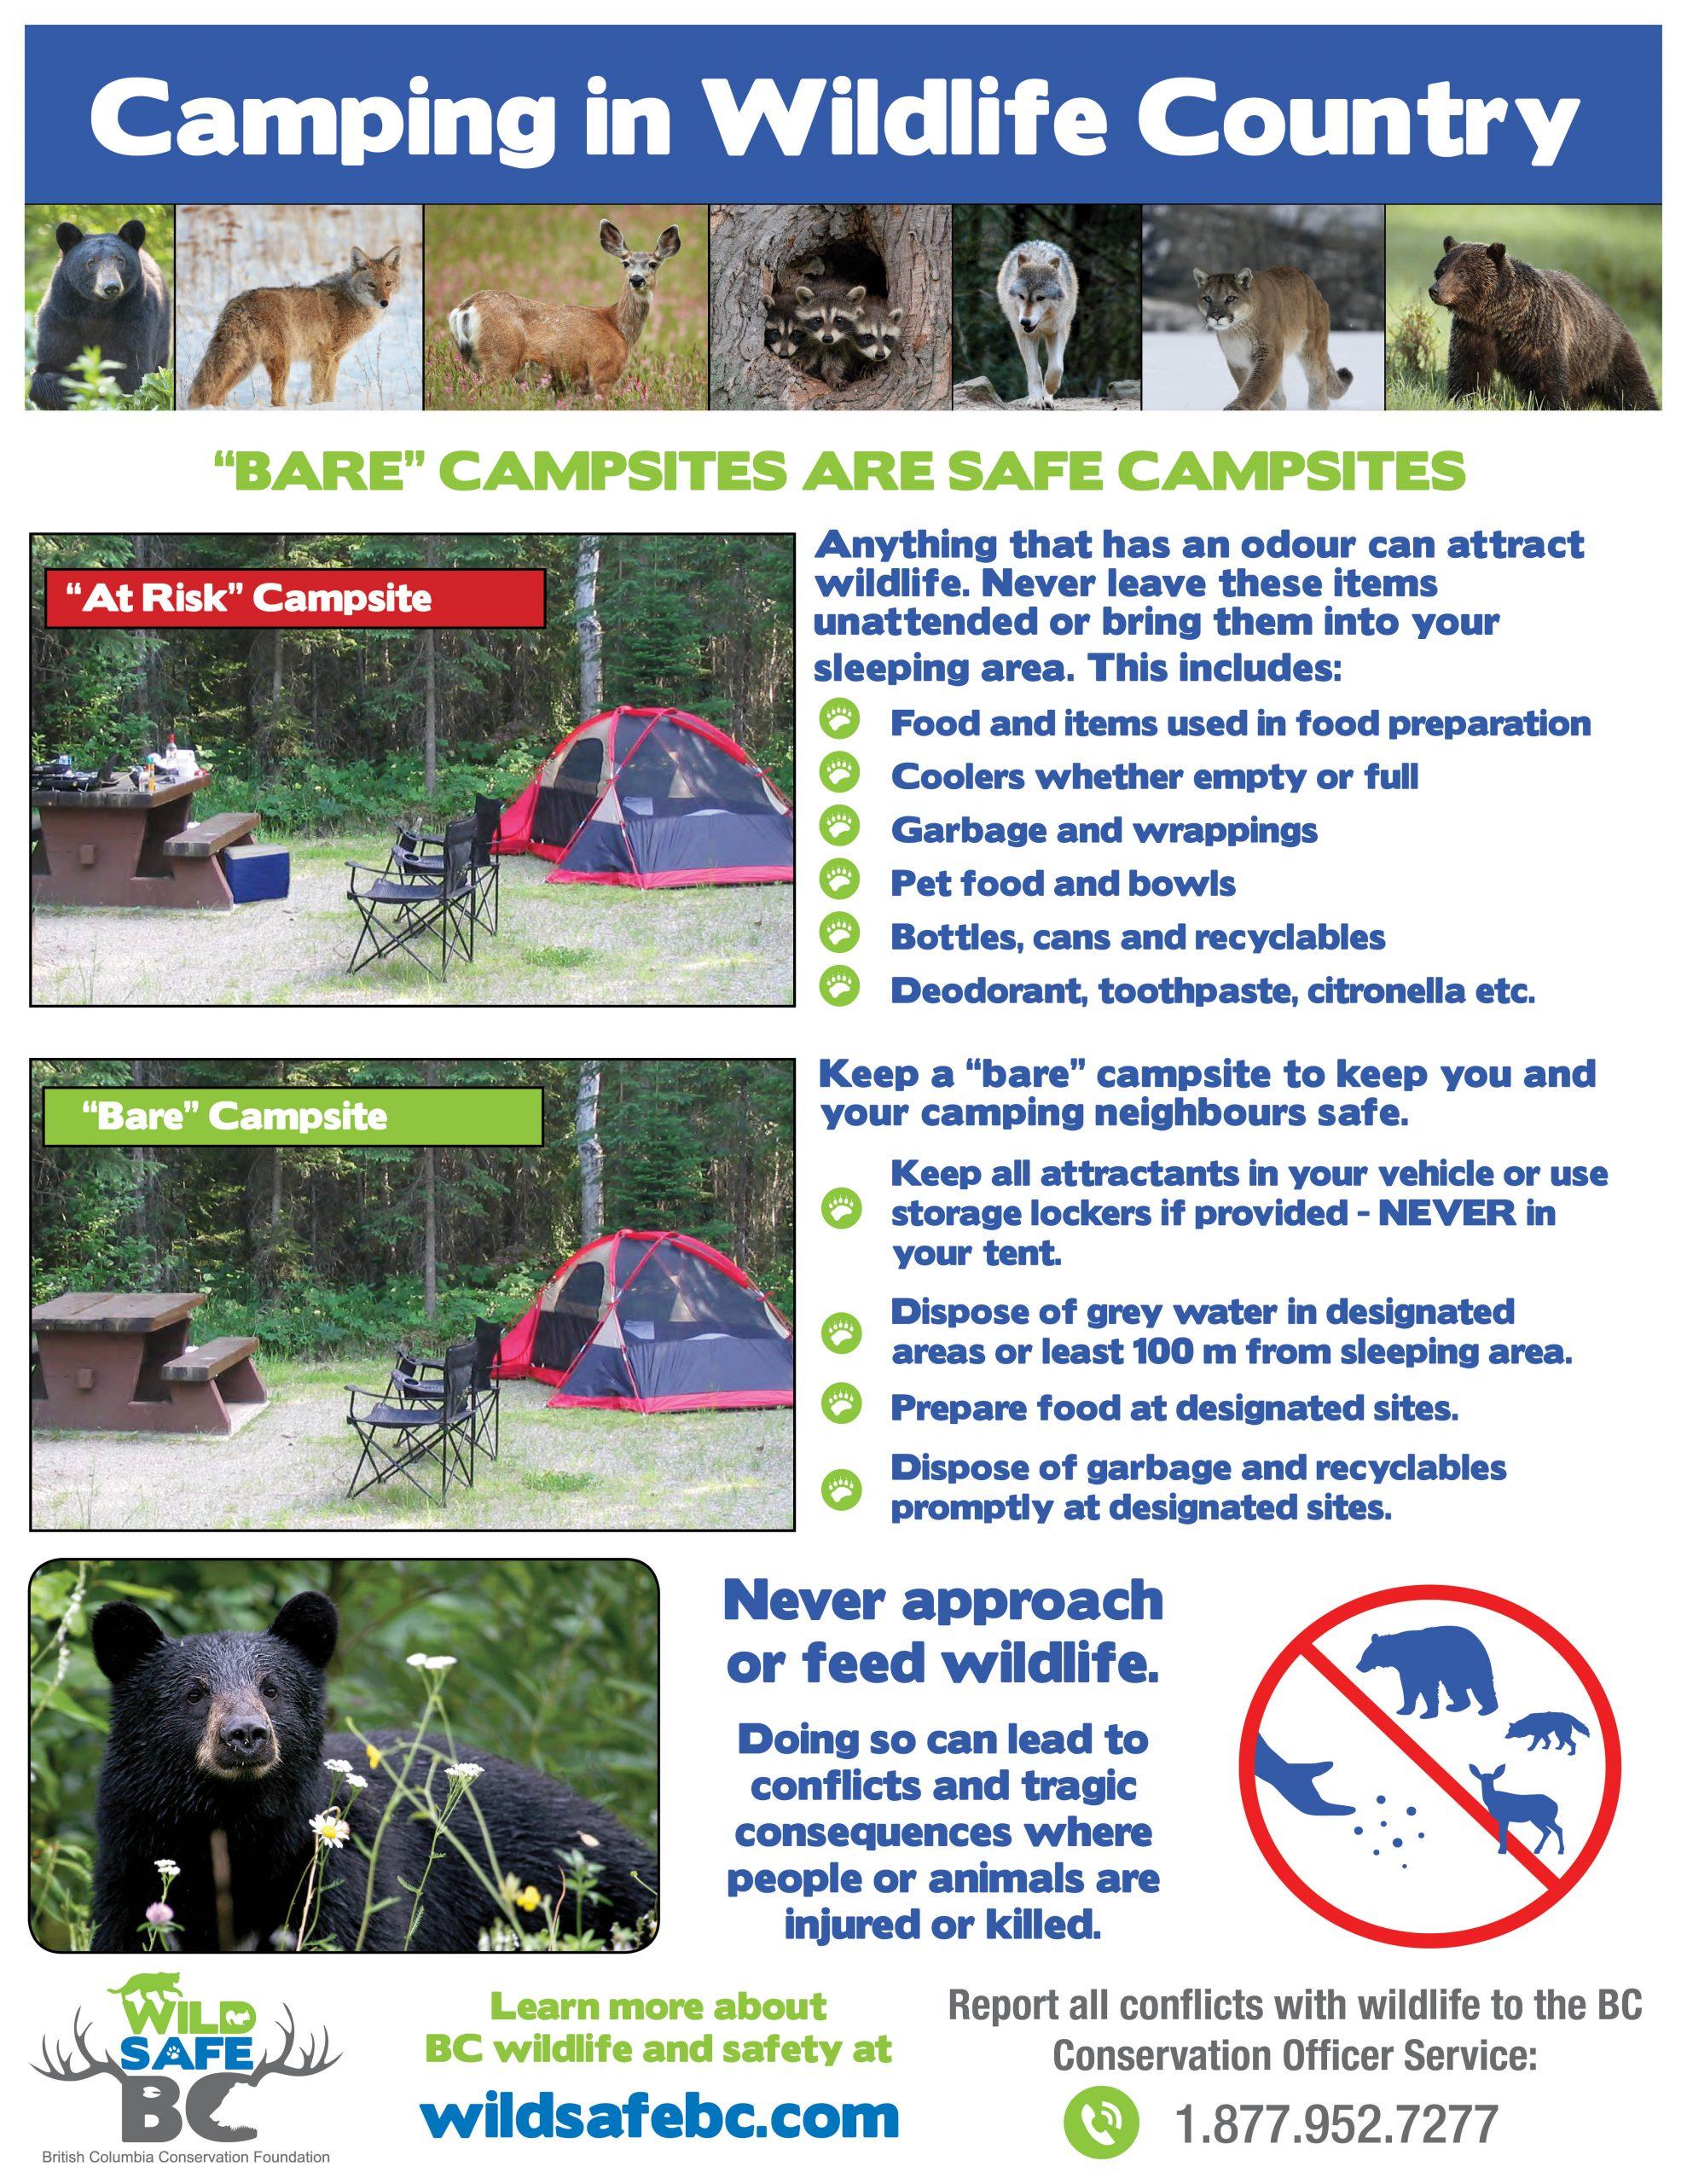 WSBC Bare Camping Poster 2020_8.5x11